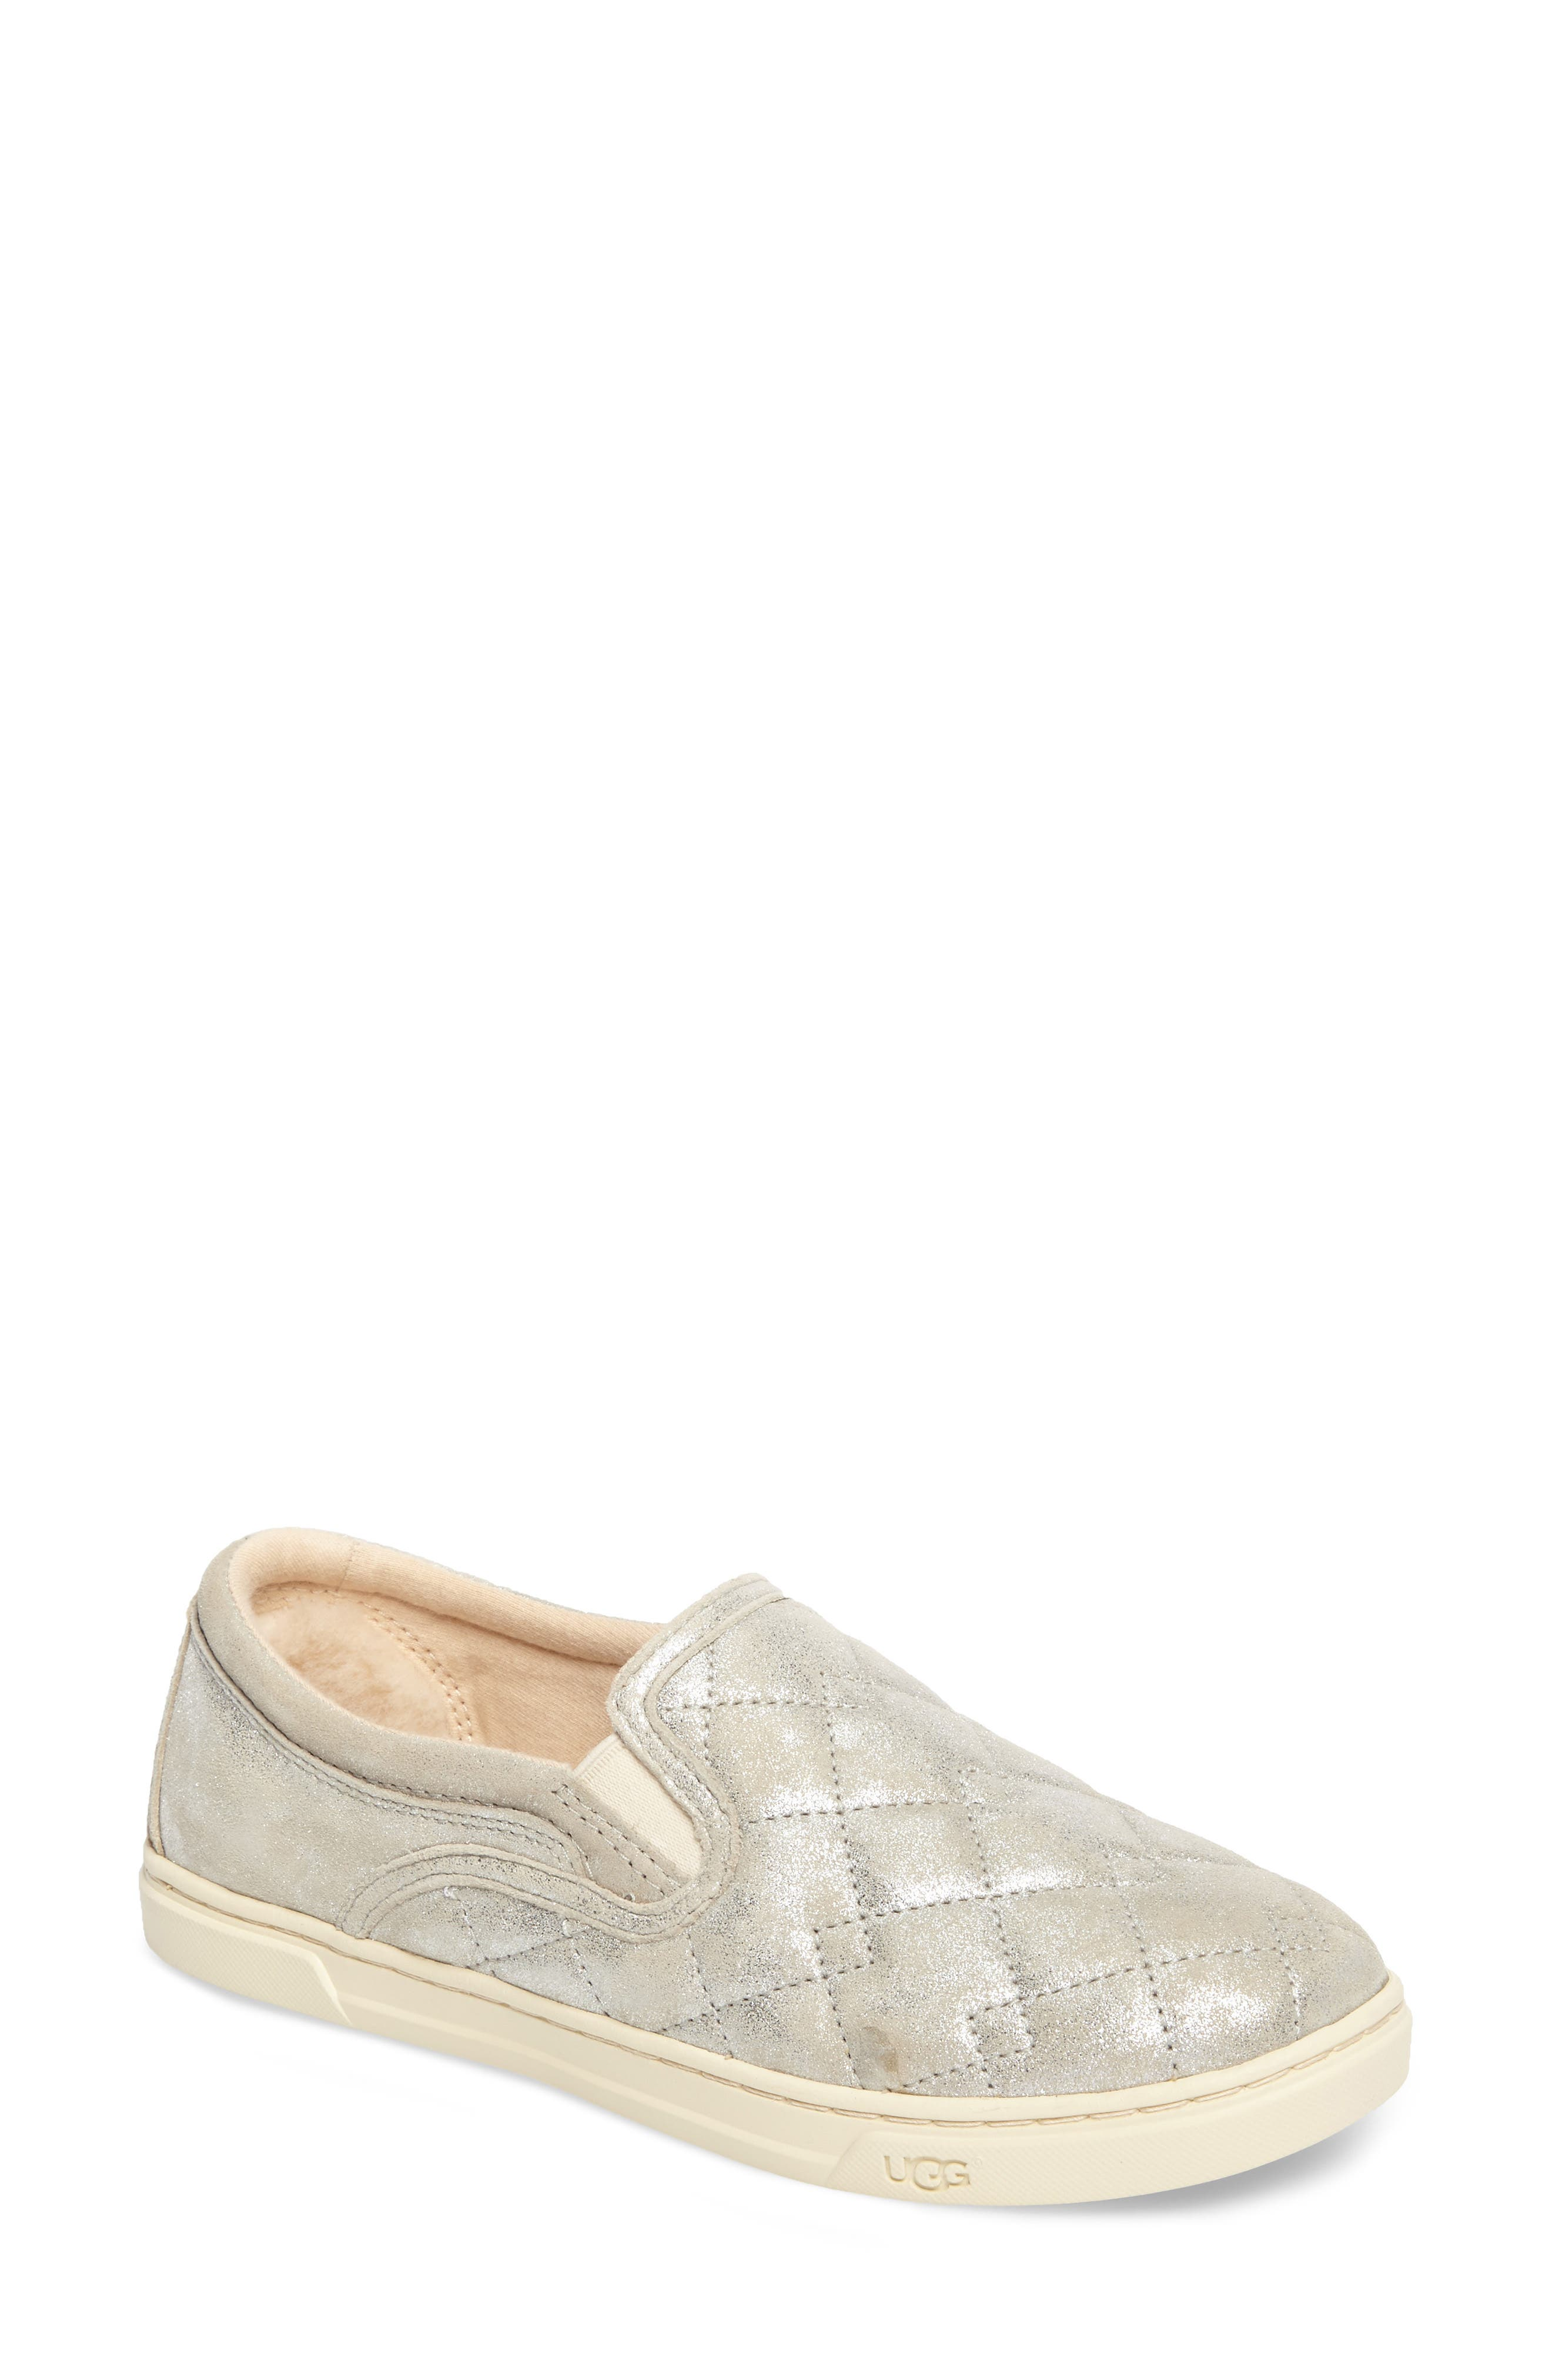 Main Image - UGG® Fierce Stardust Quilted Slip-On Sneaker (Women)